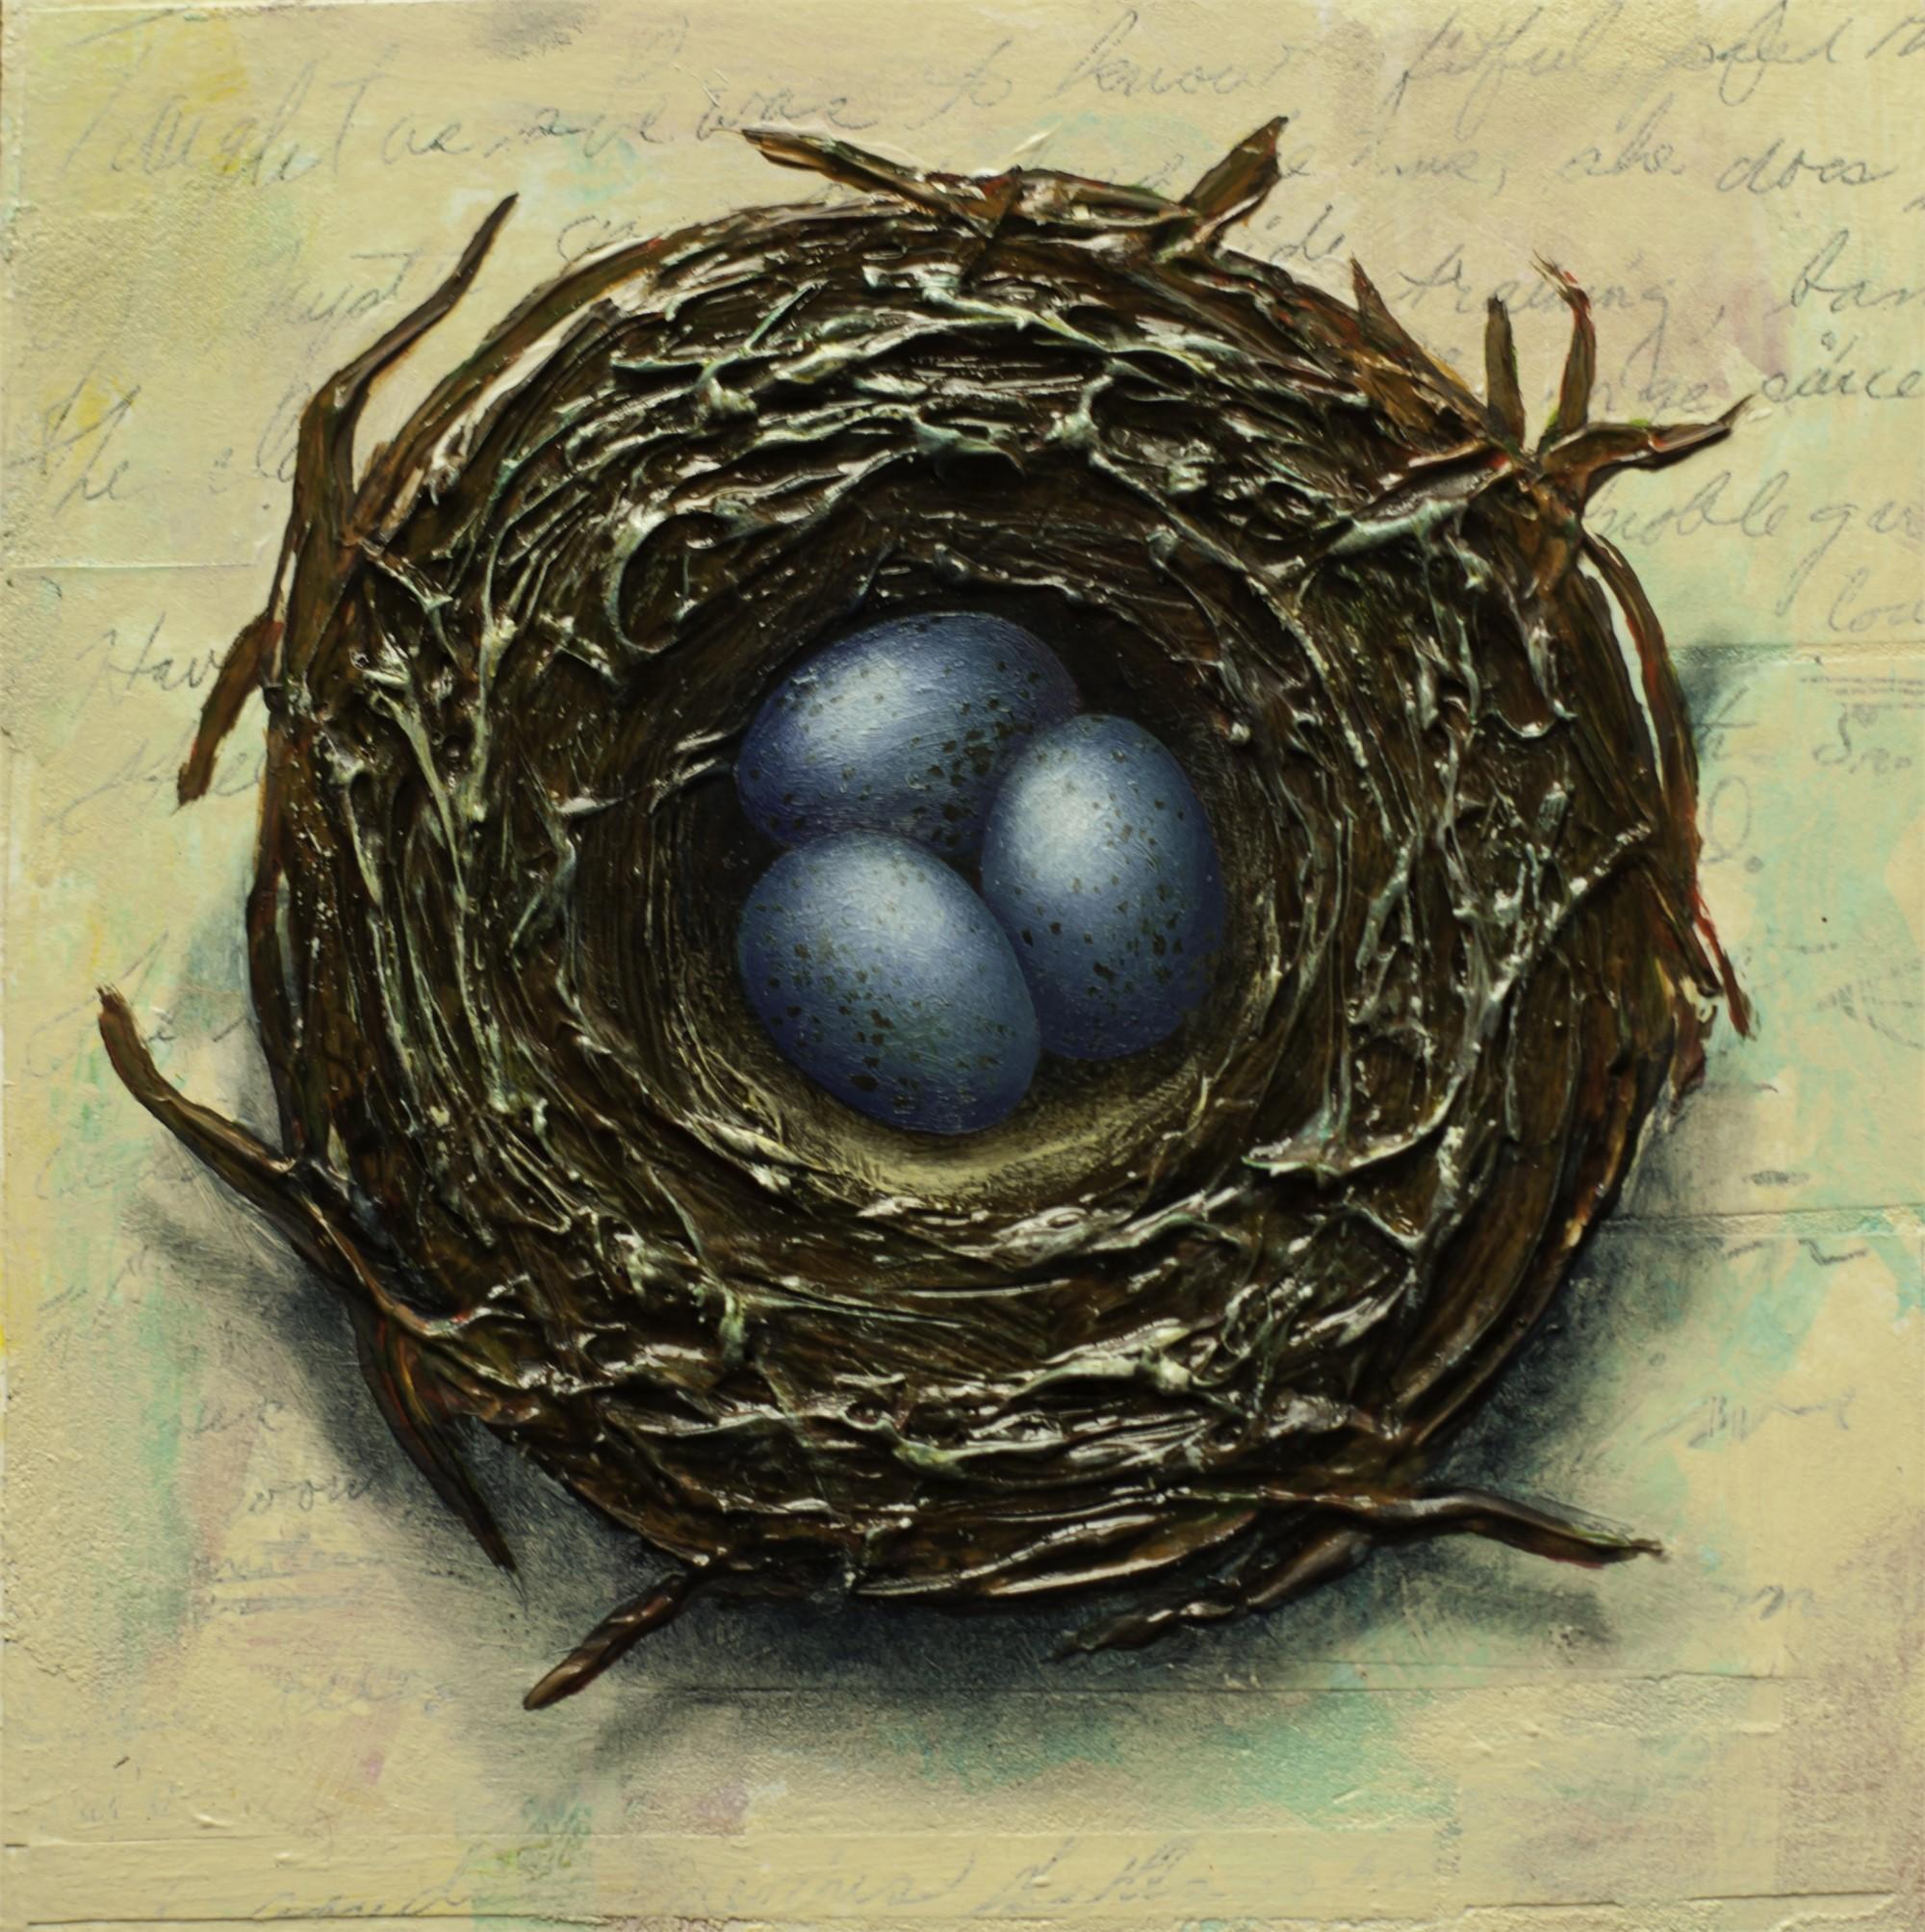 Nest with Three Eggs by Thane Gorek